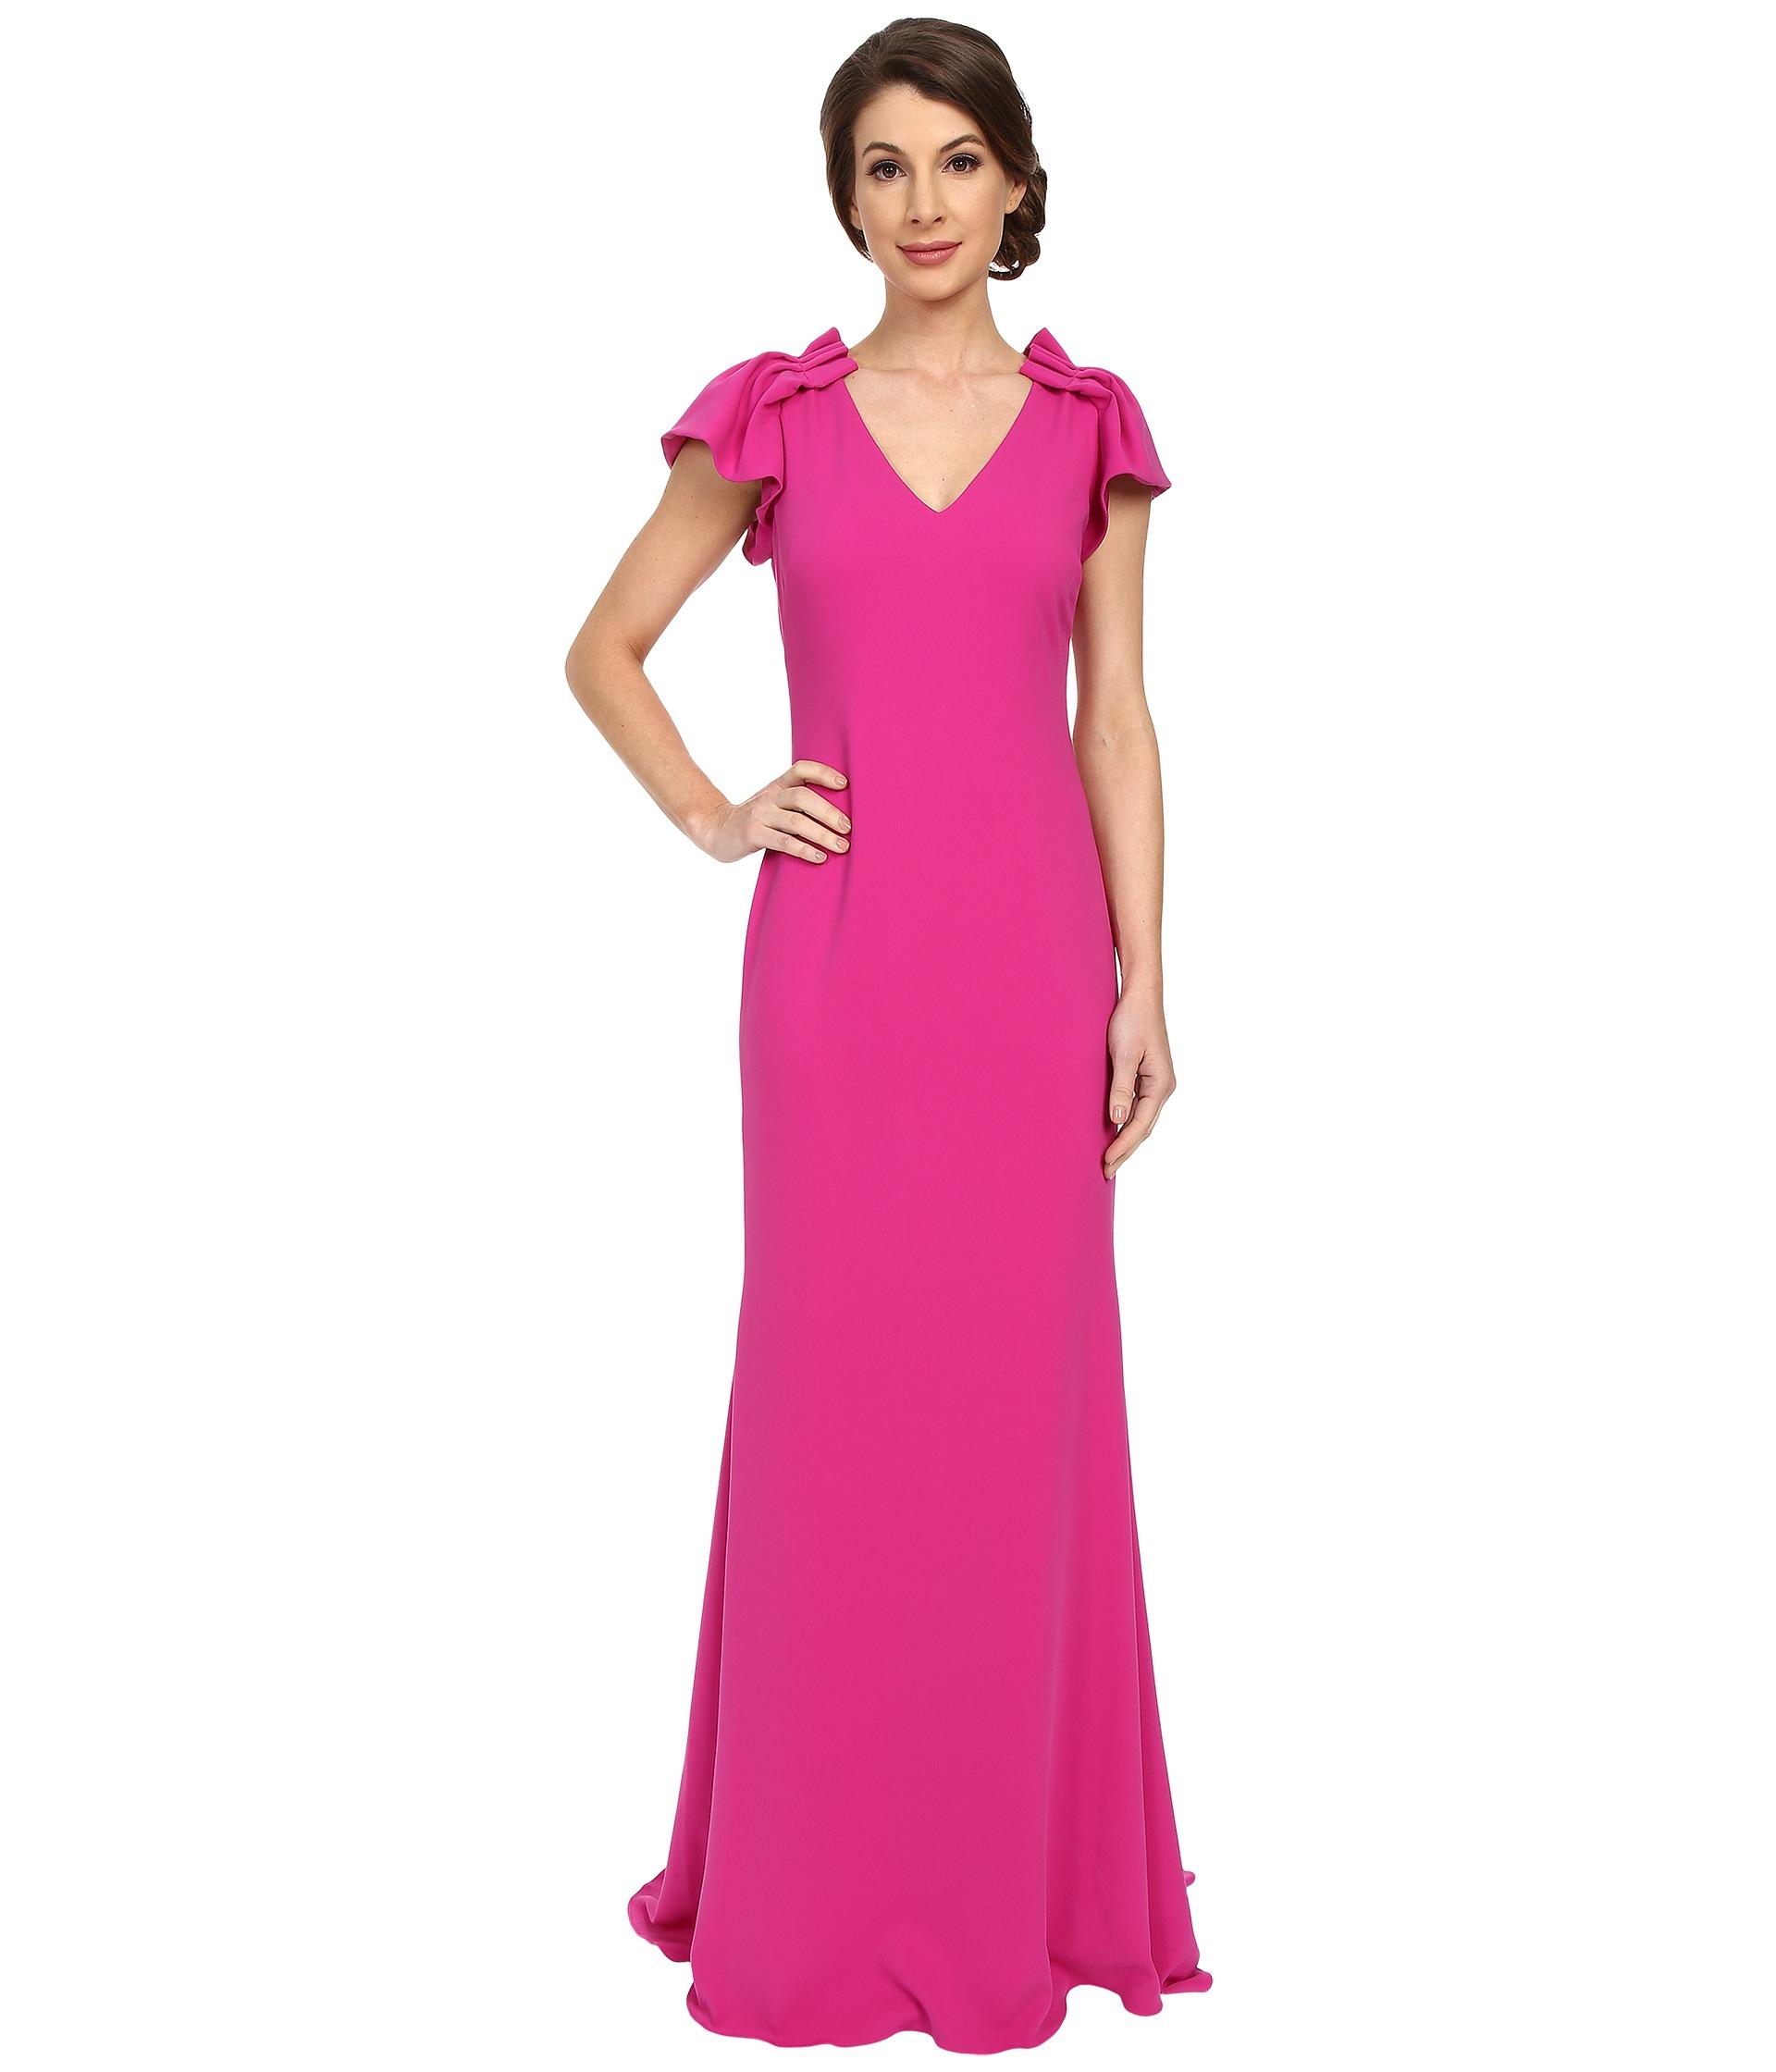 Lyst - Badgley Mischka Ruffle Sleeve V-neck Gown in Purple